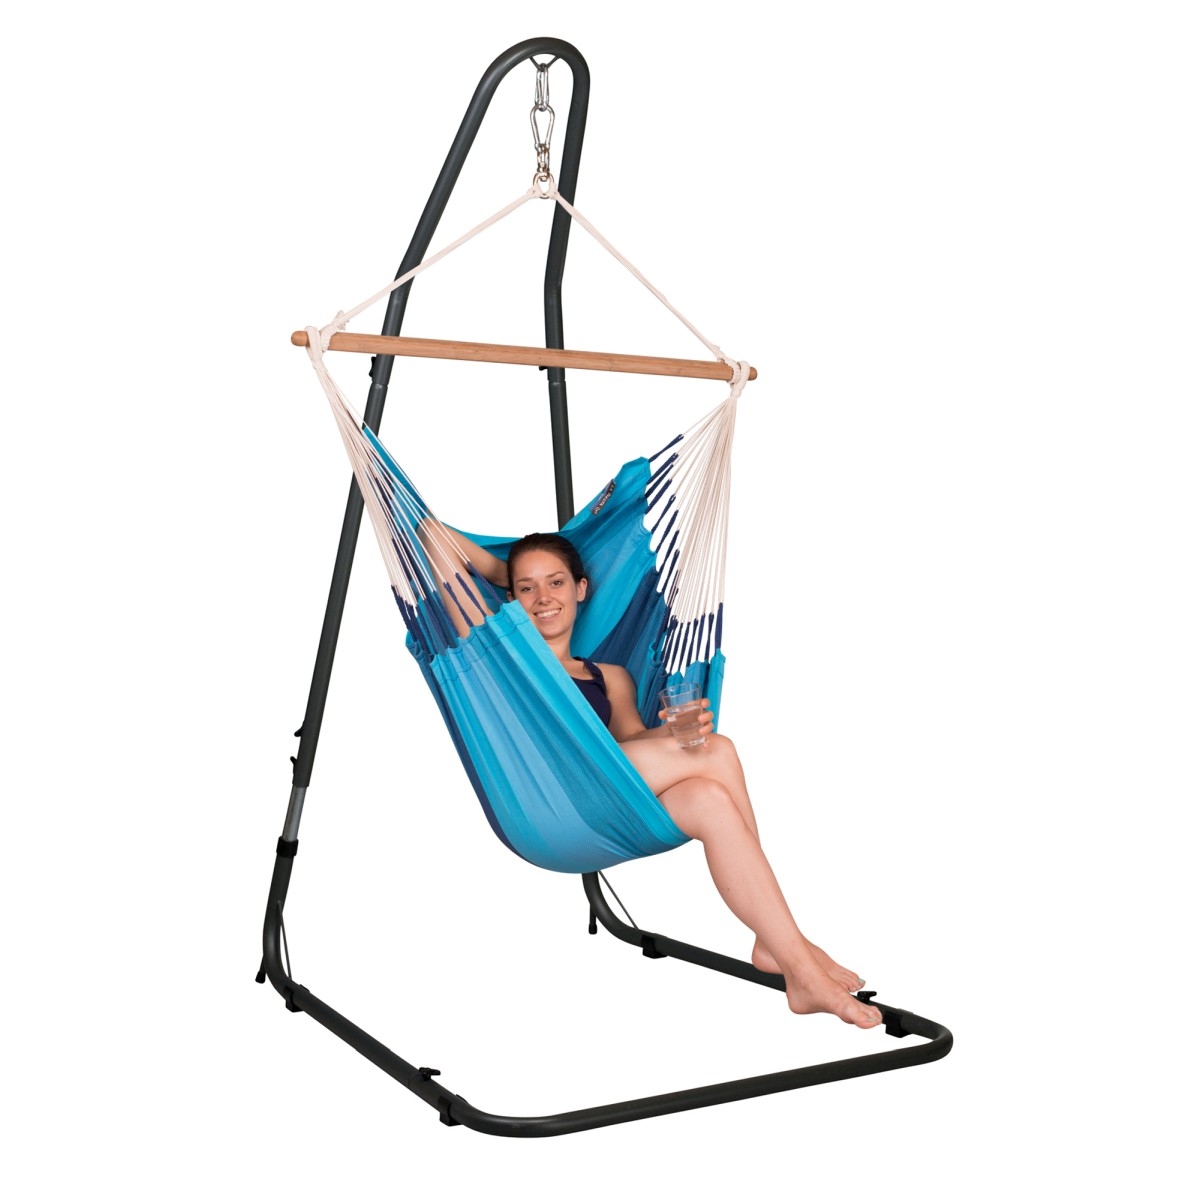 la siesta chaise hamac basic orquidea lagoon support. Black Bedroom Furniture Sets. Home Design Ideas